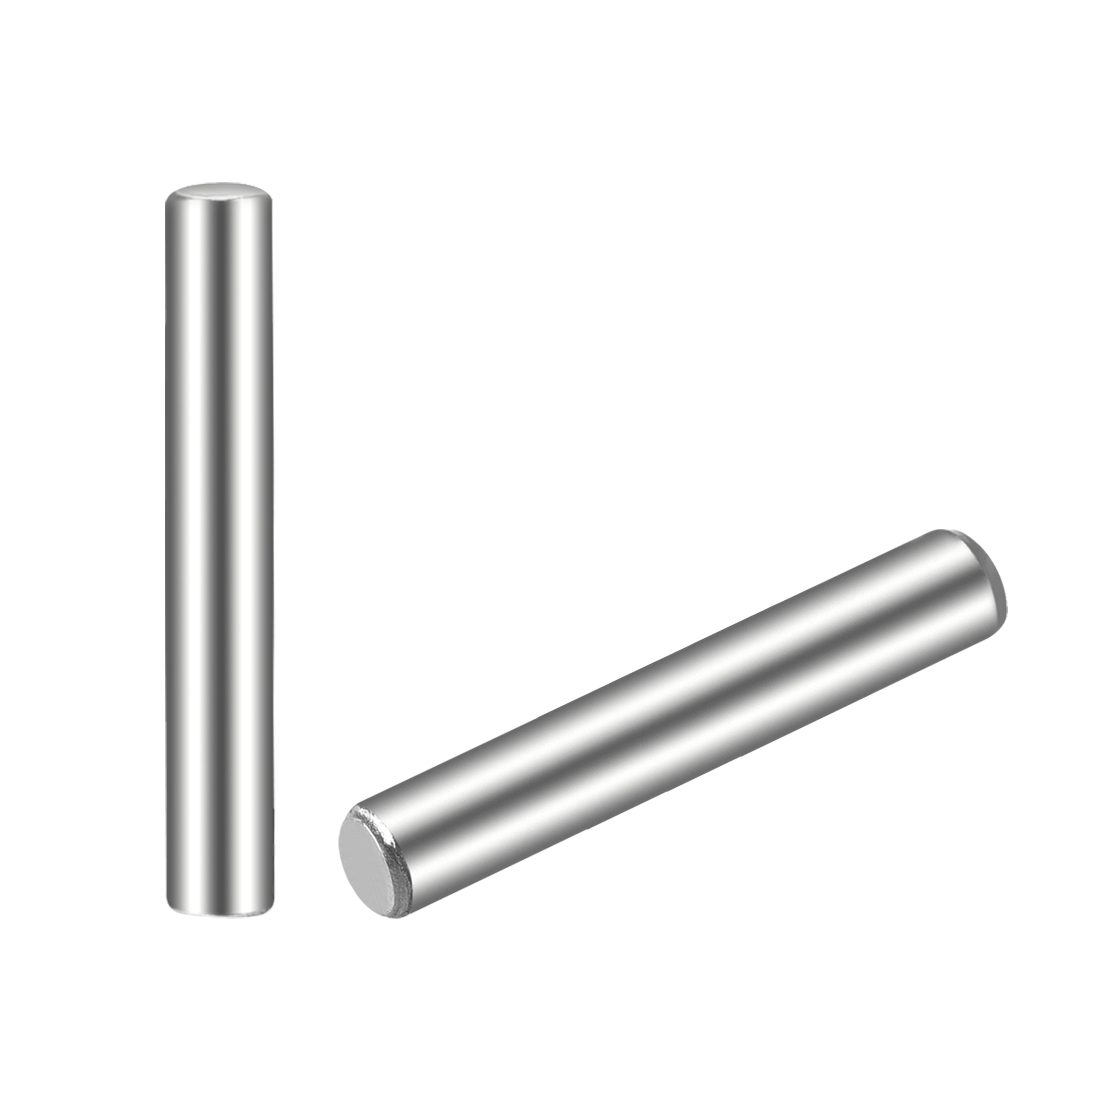 50Pcs 2.5mm x 18mm Dowel Pin 304 Stainless Steel Shelf Support Pin Fasten